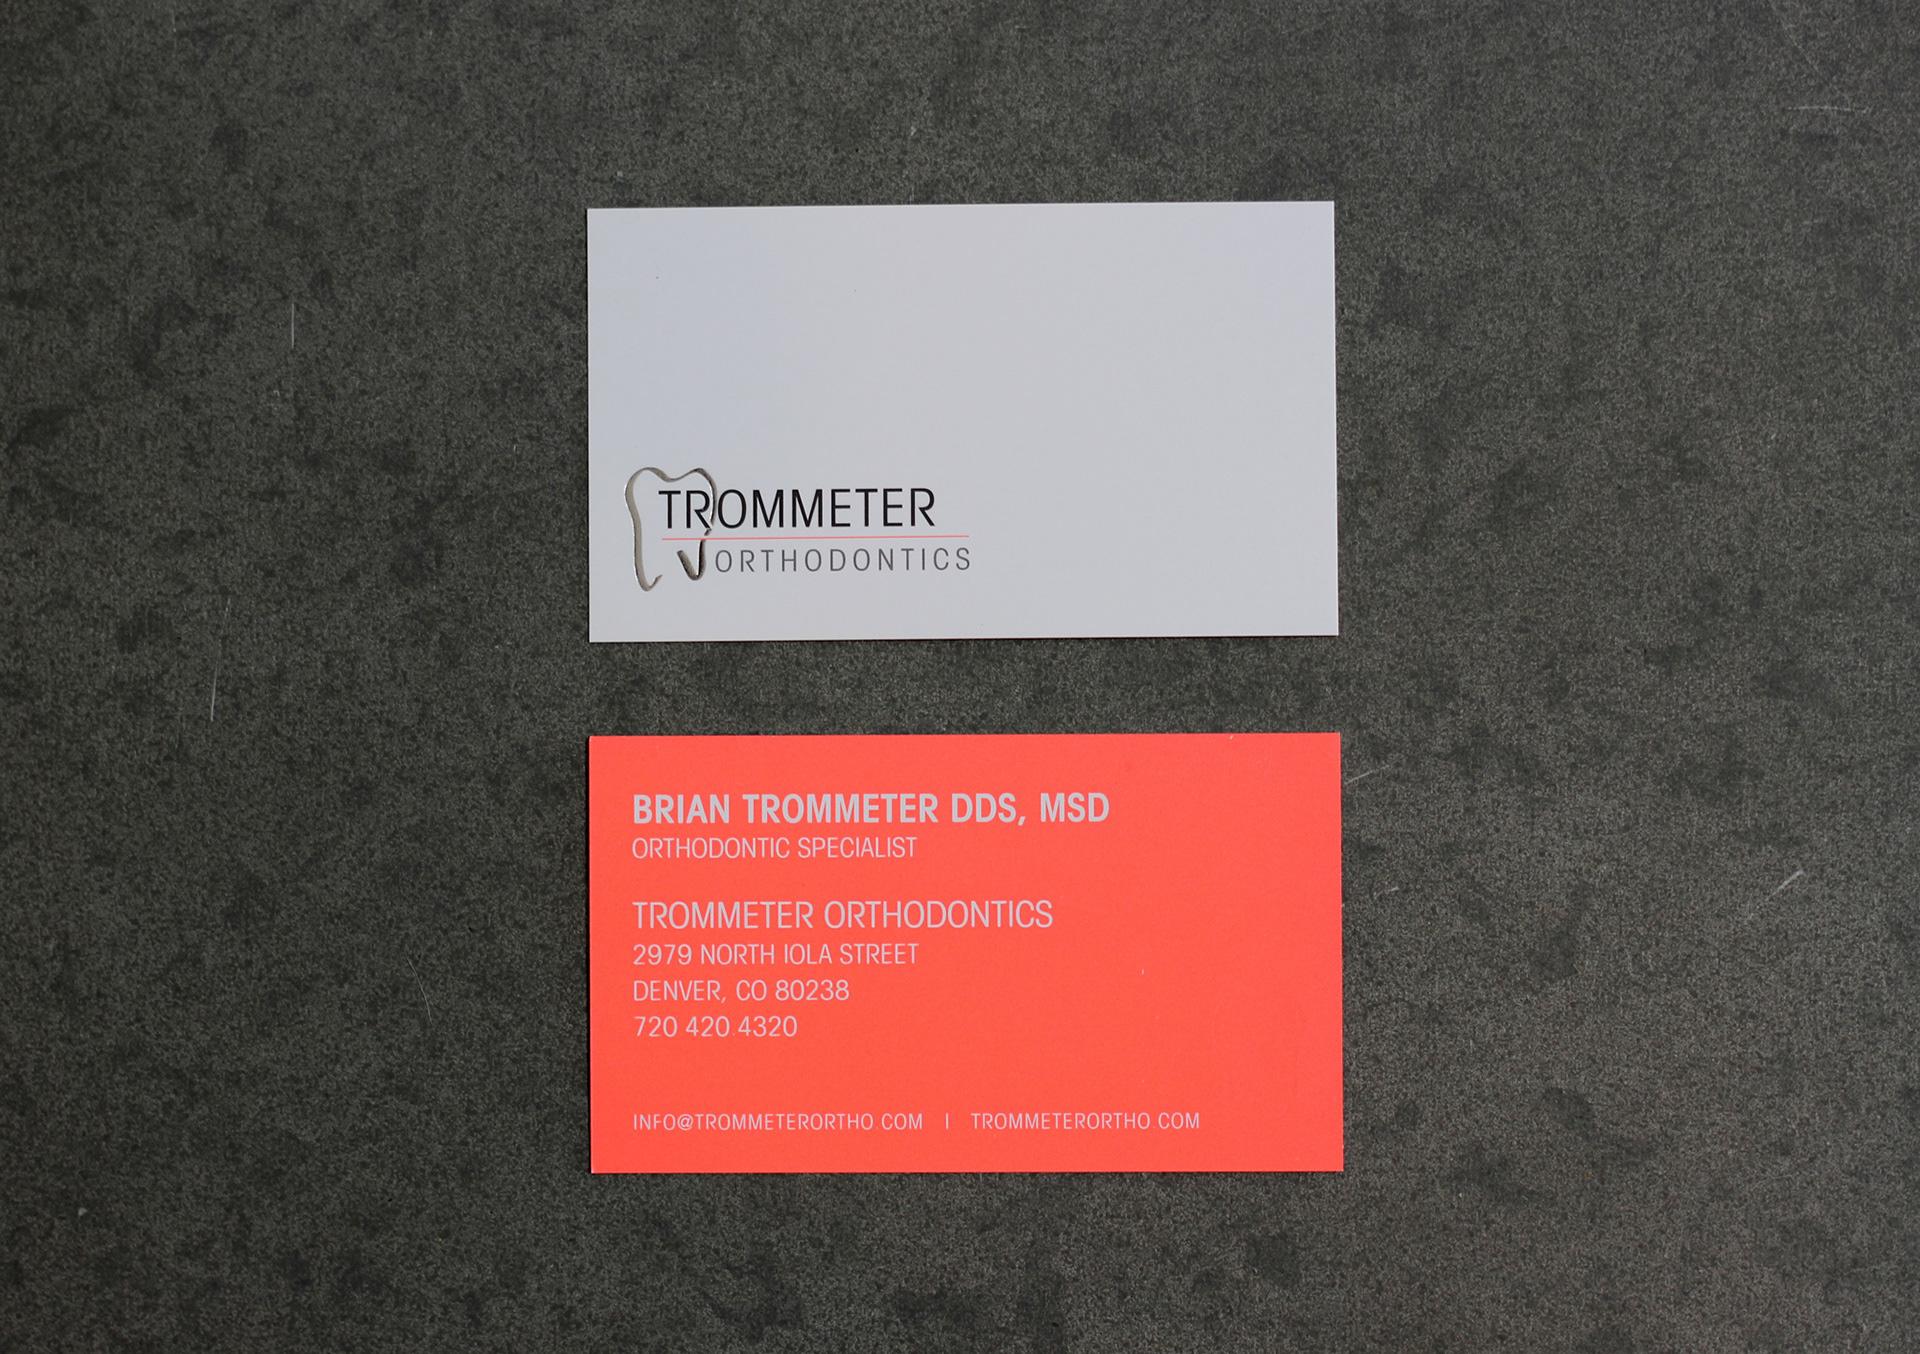 Taylor Grant - Trommeter Orthodontics